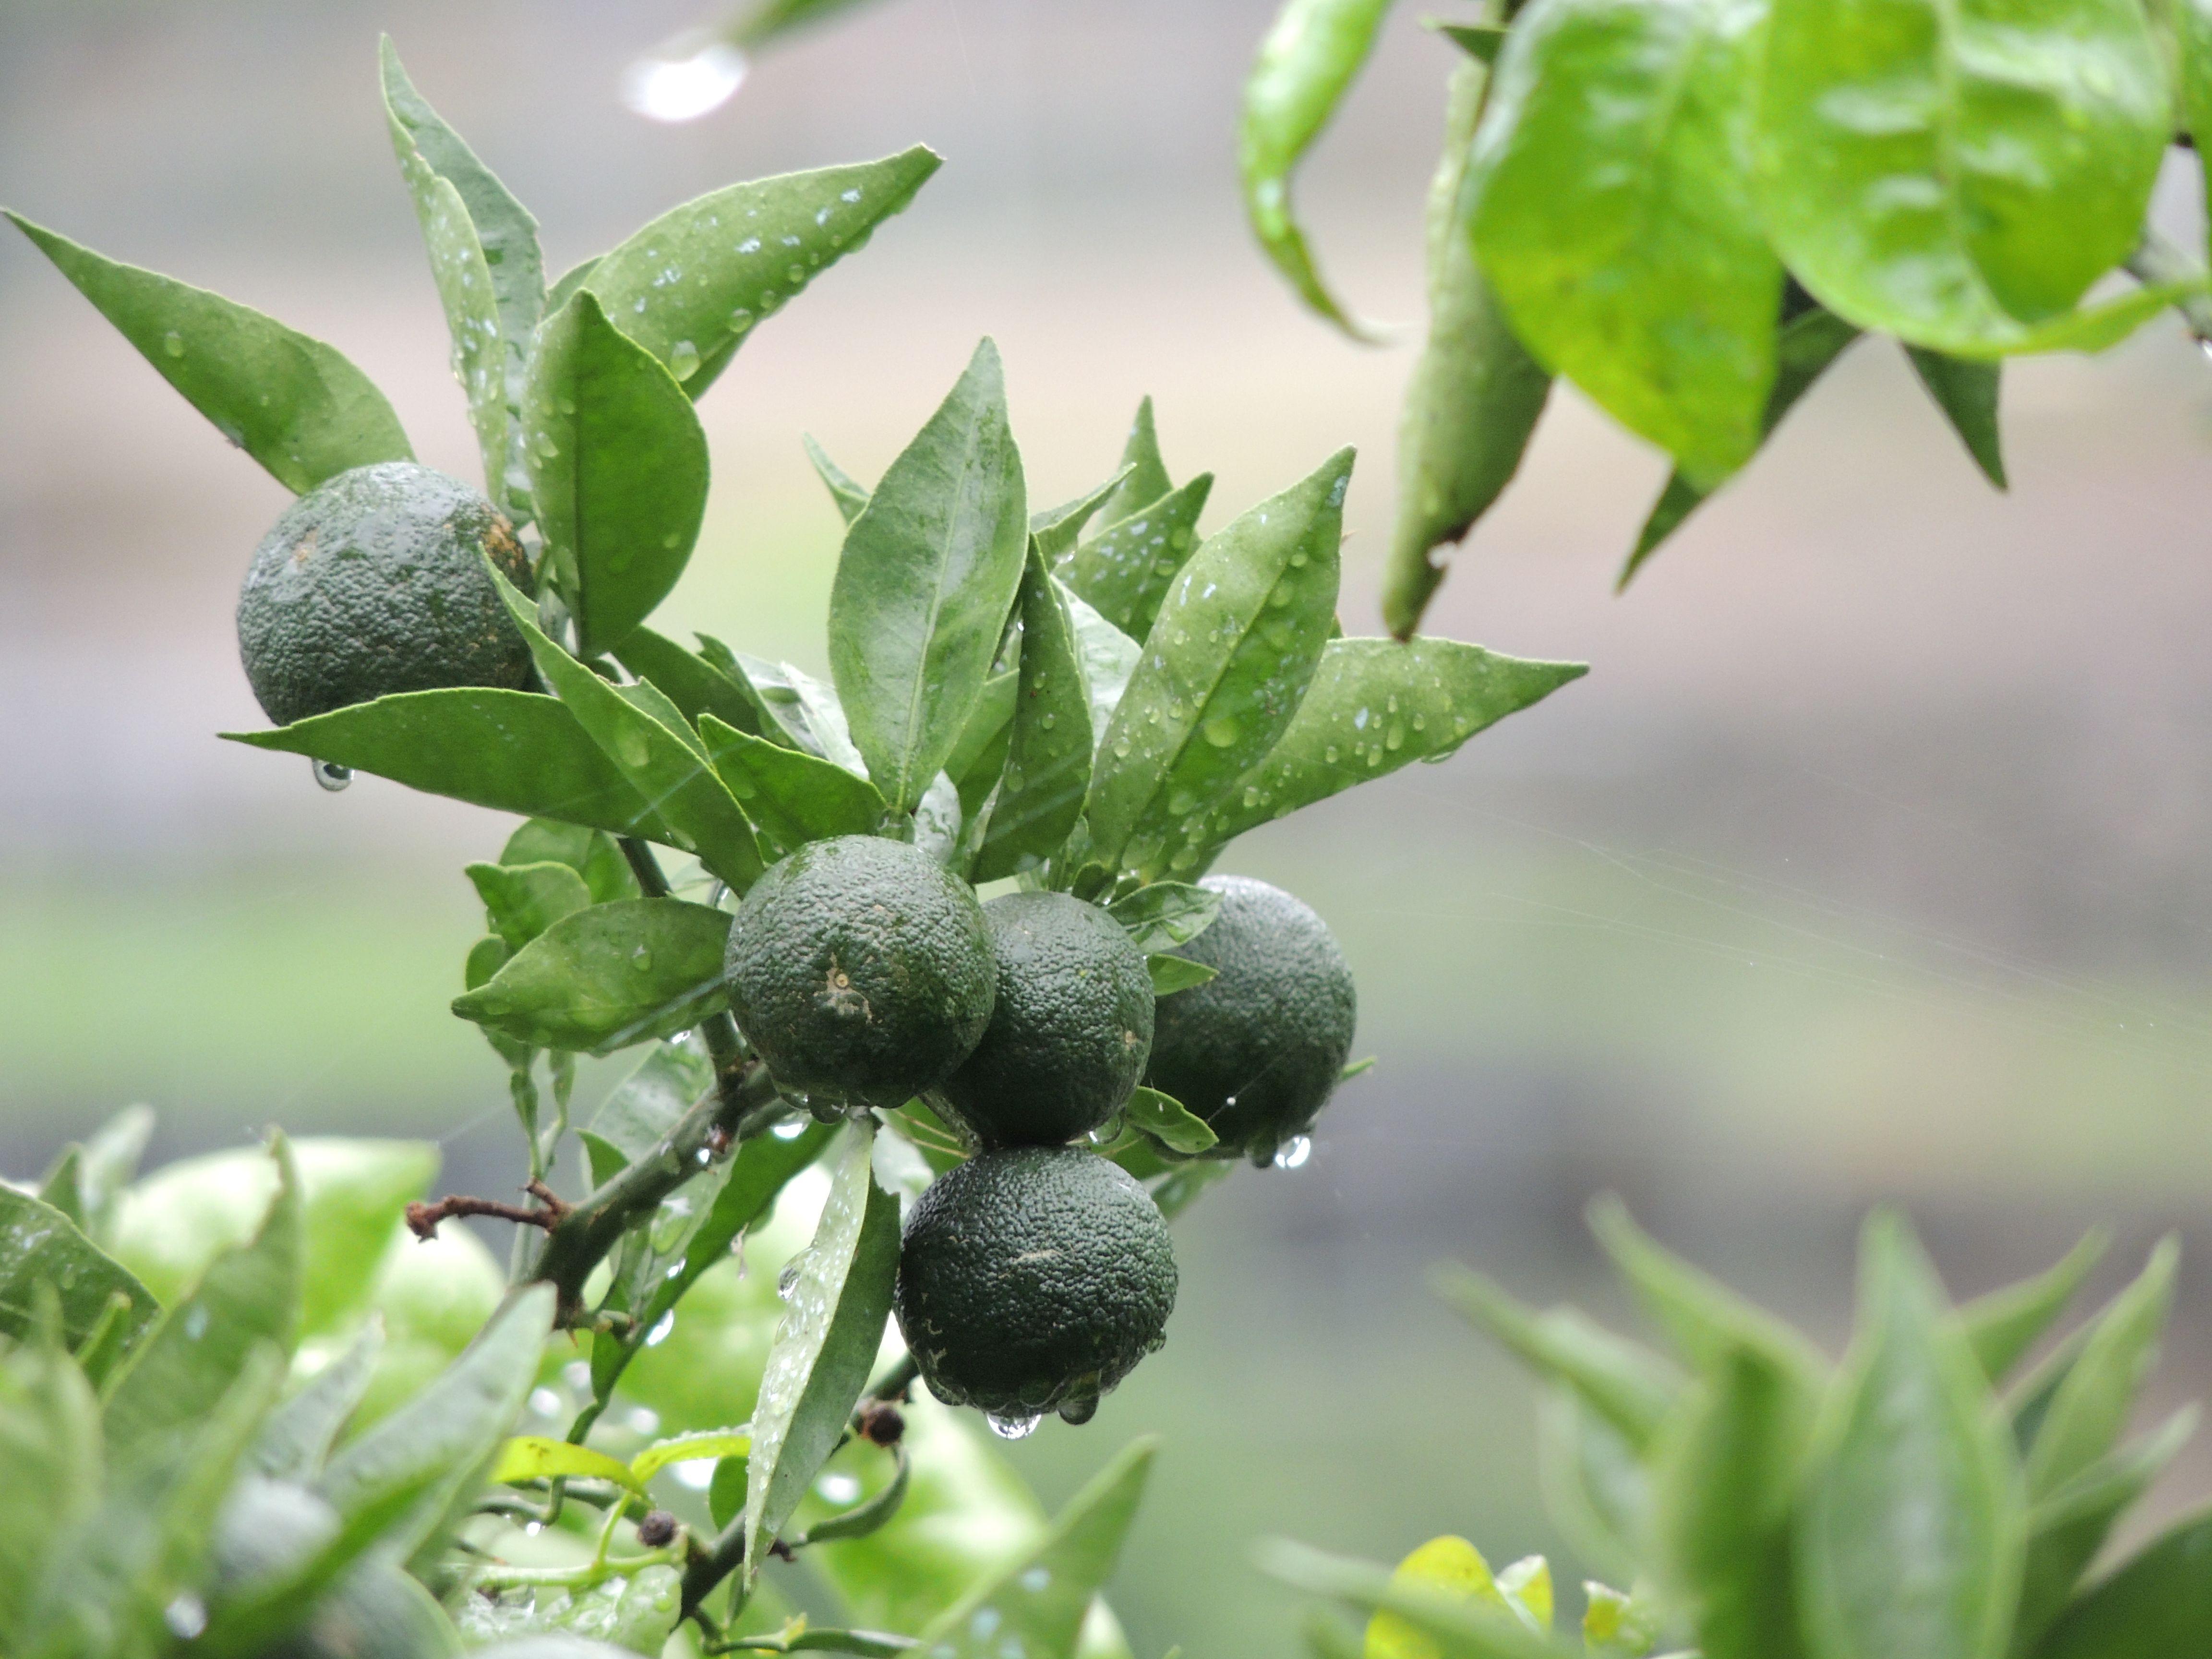 sudachi , a kind of citruses, very popular where I live